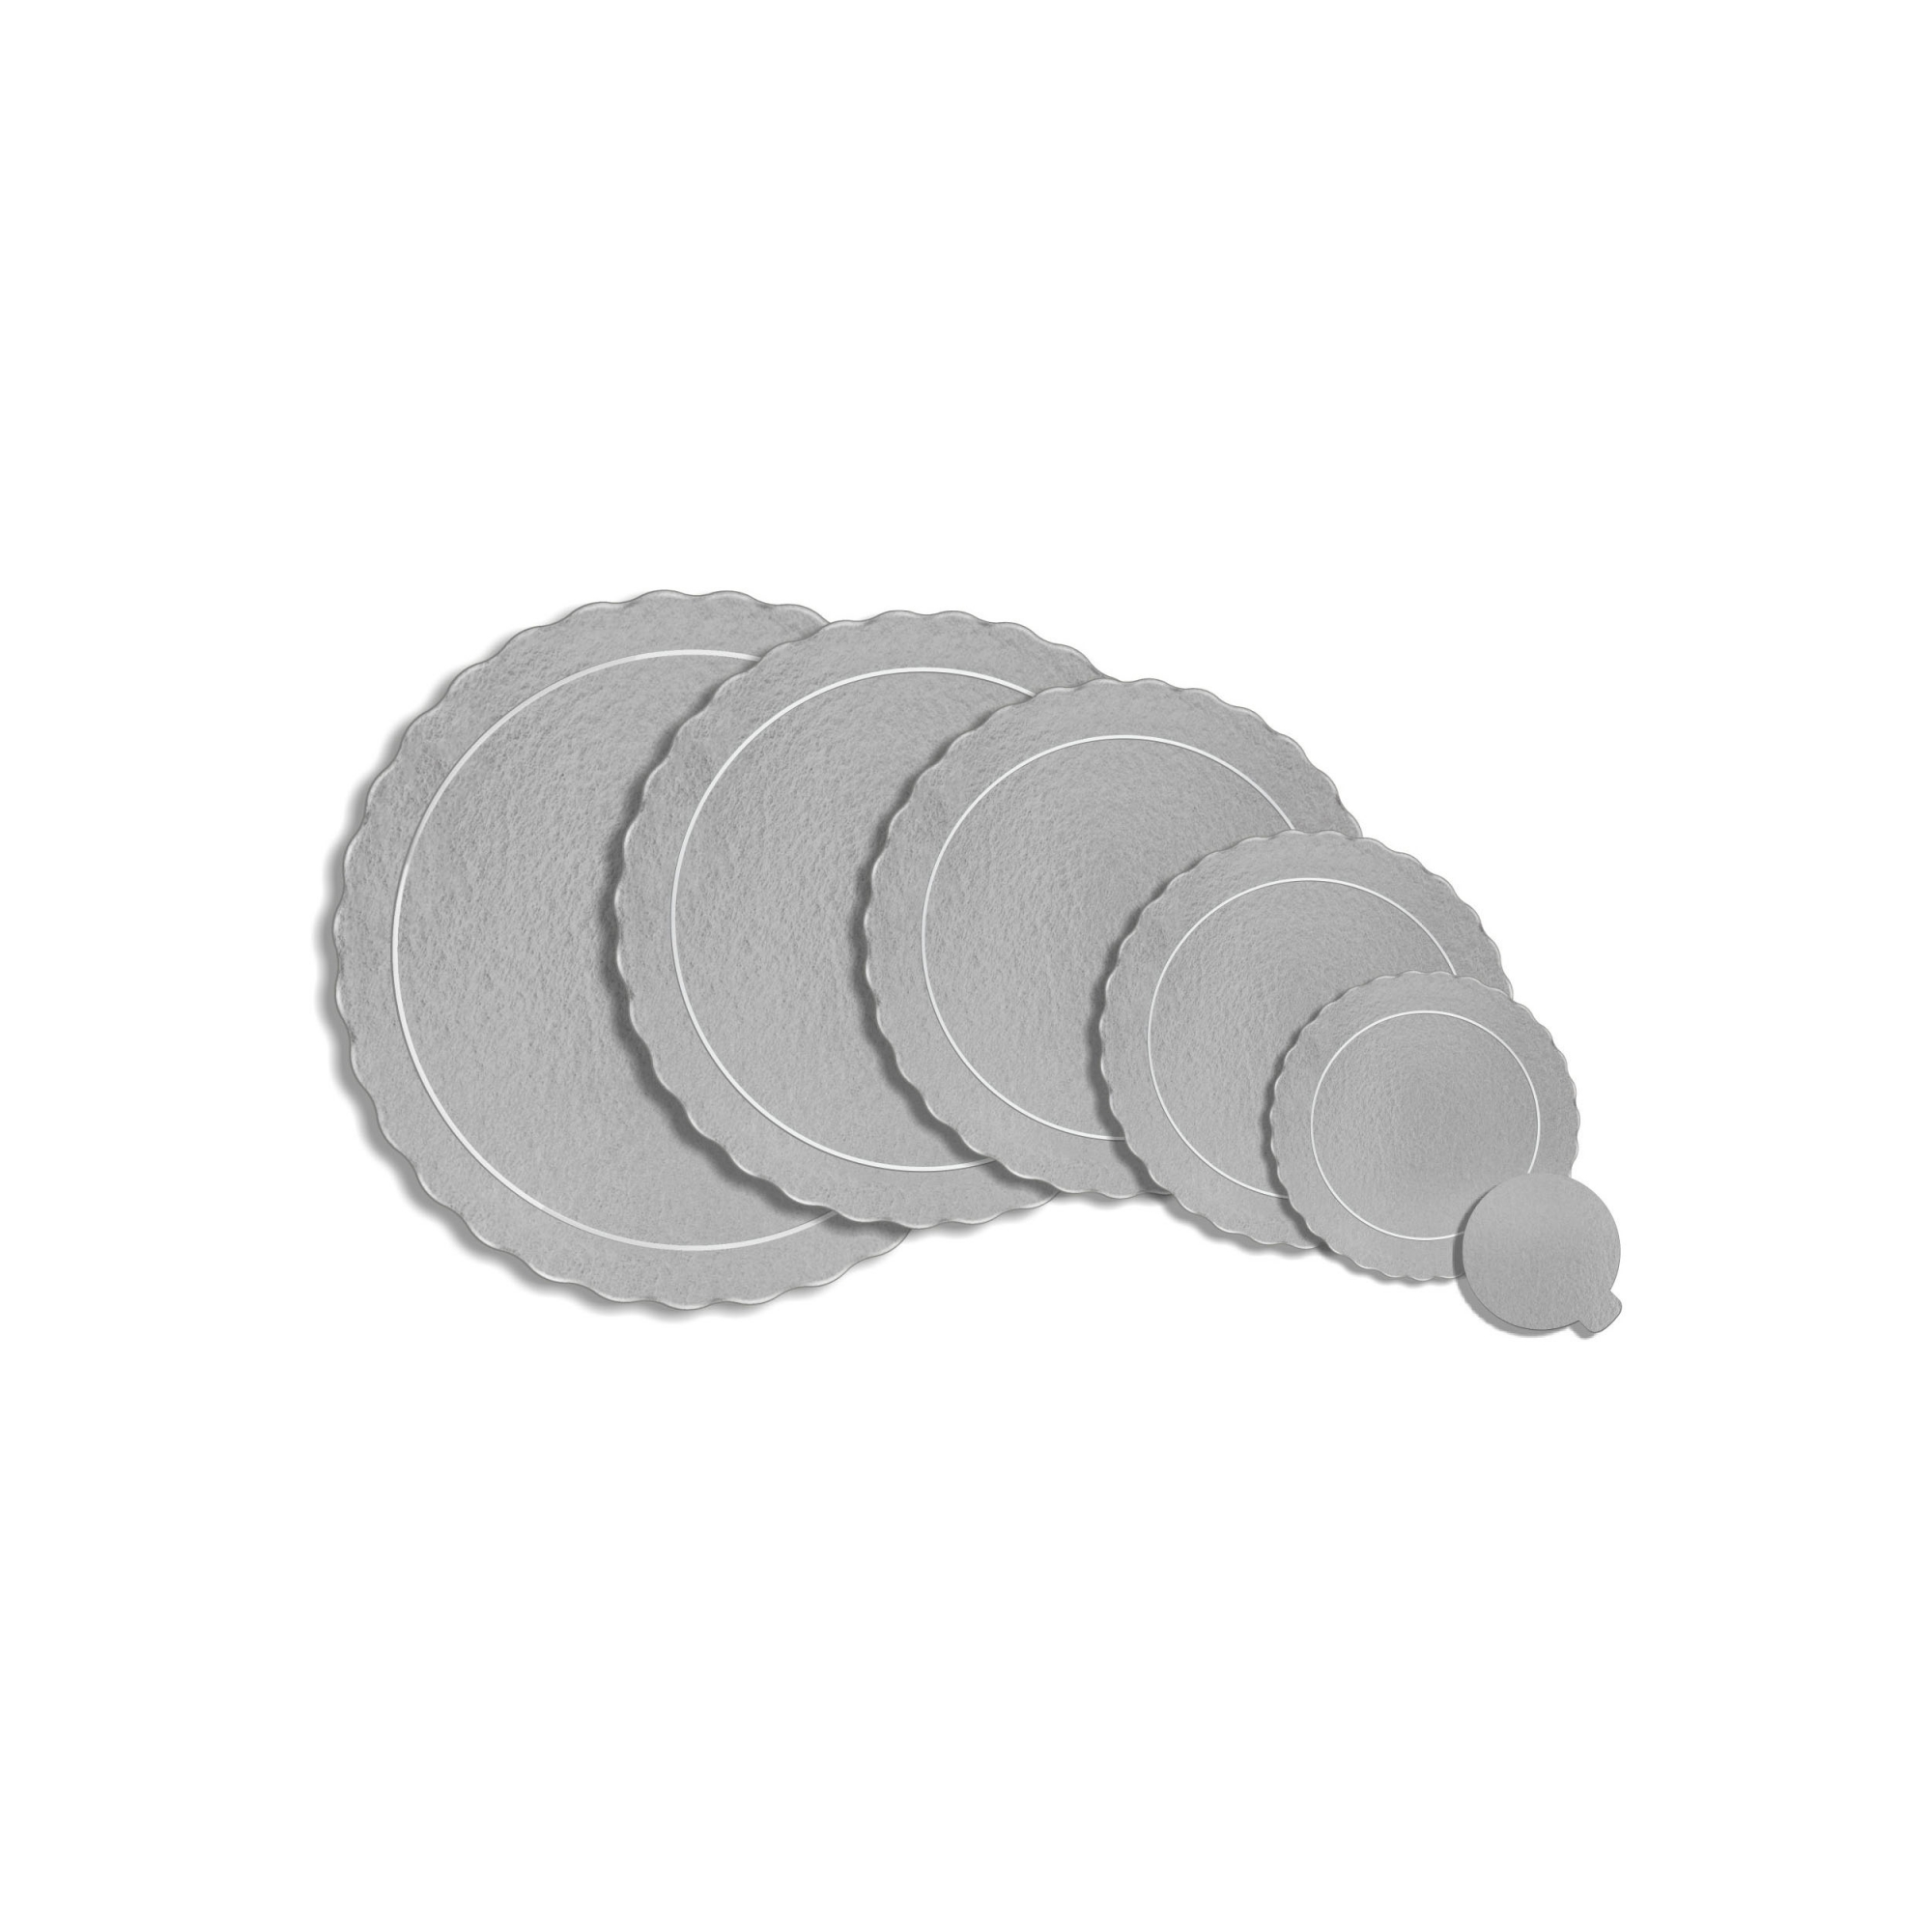 100 Bases Laminadas, Suporte P/ Bolo, Cake Board, Kit 15, 20 e 25cm - Prata